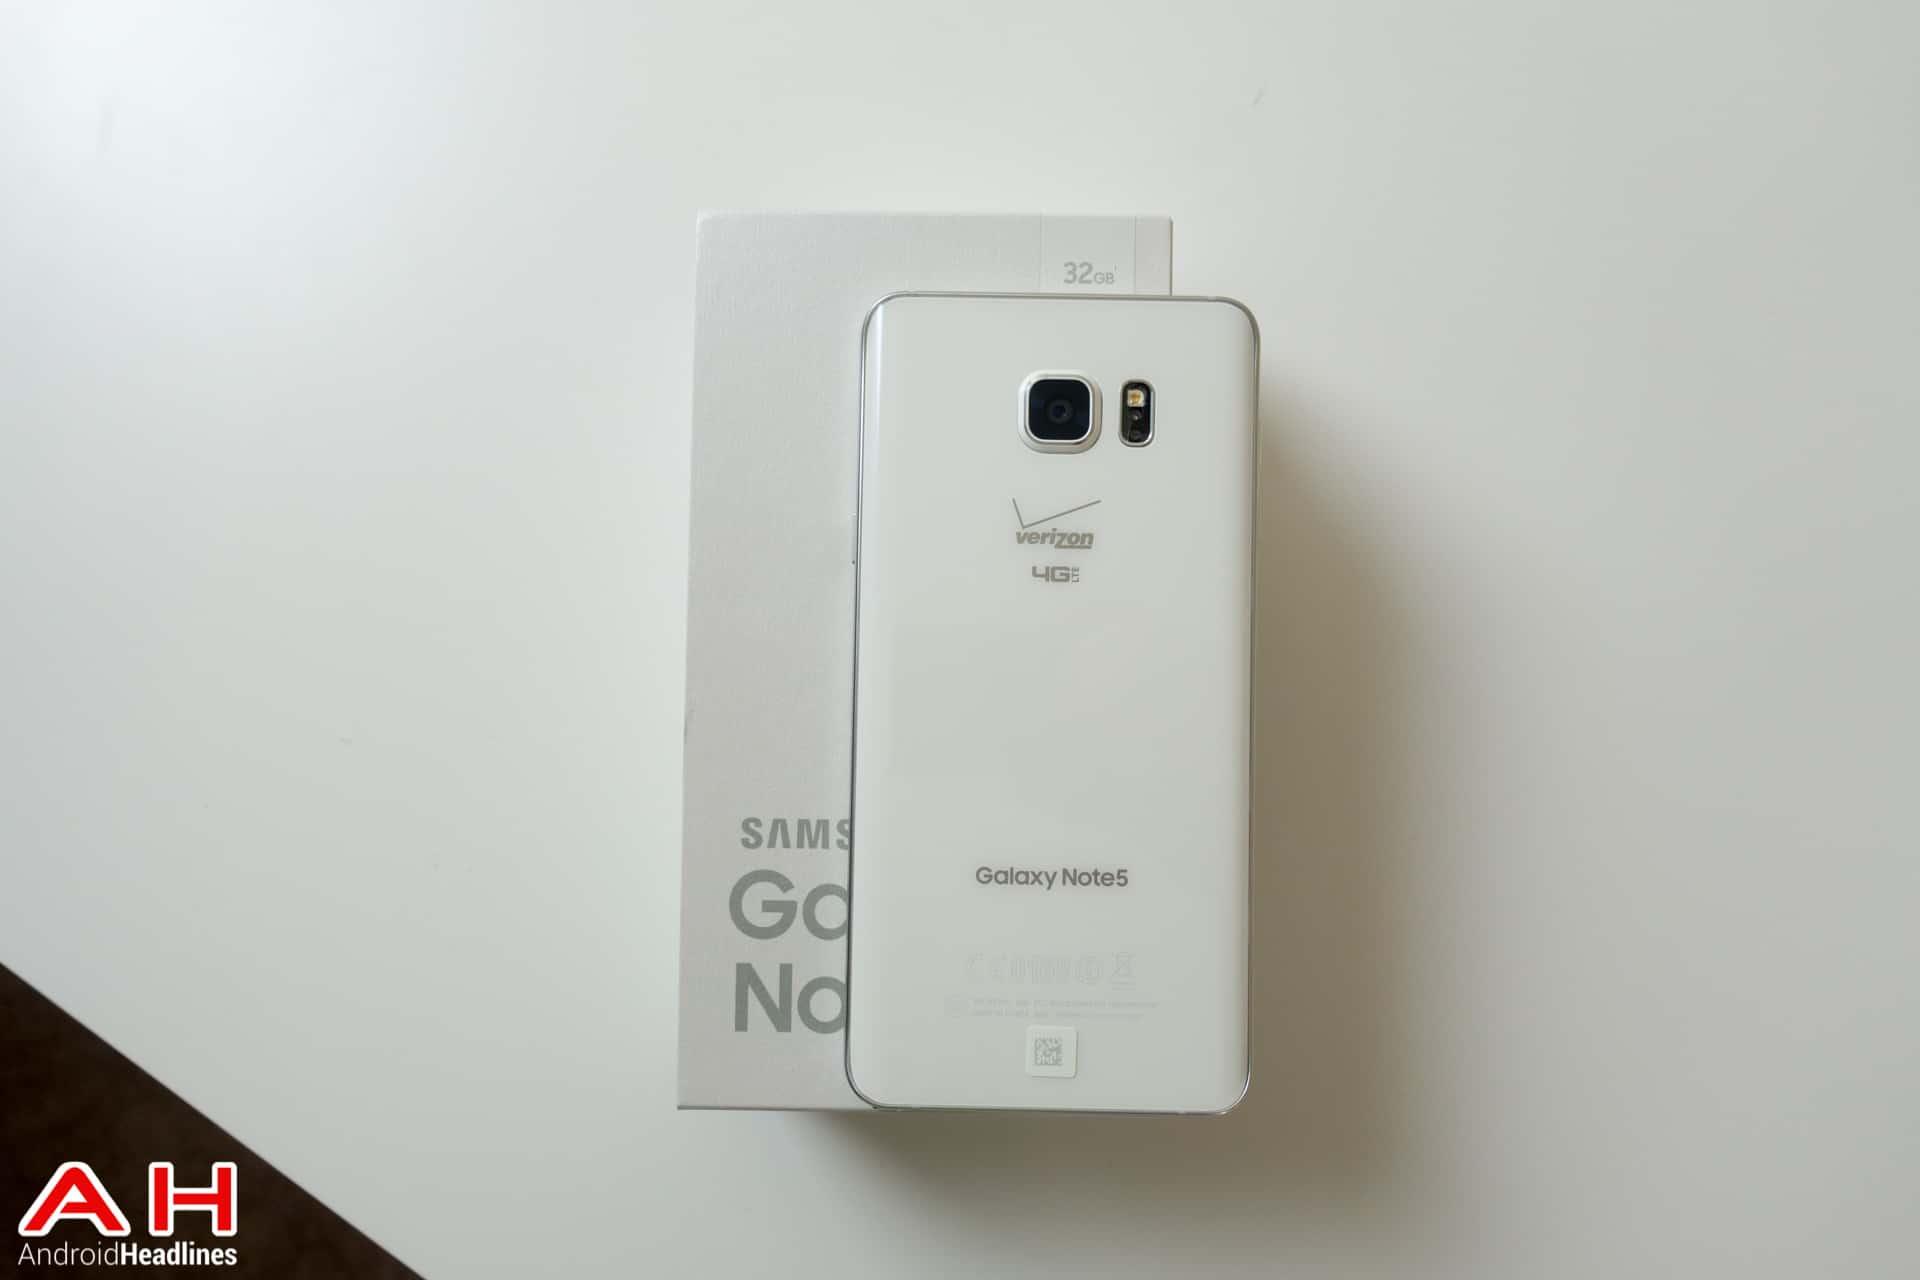 Galaxy-Note-5-AH-1